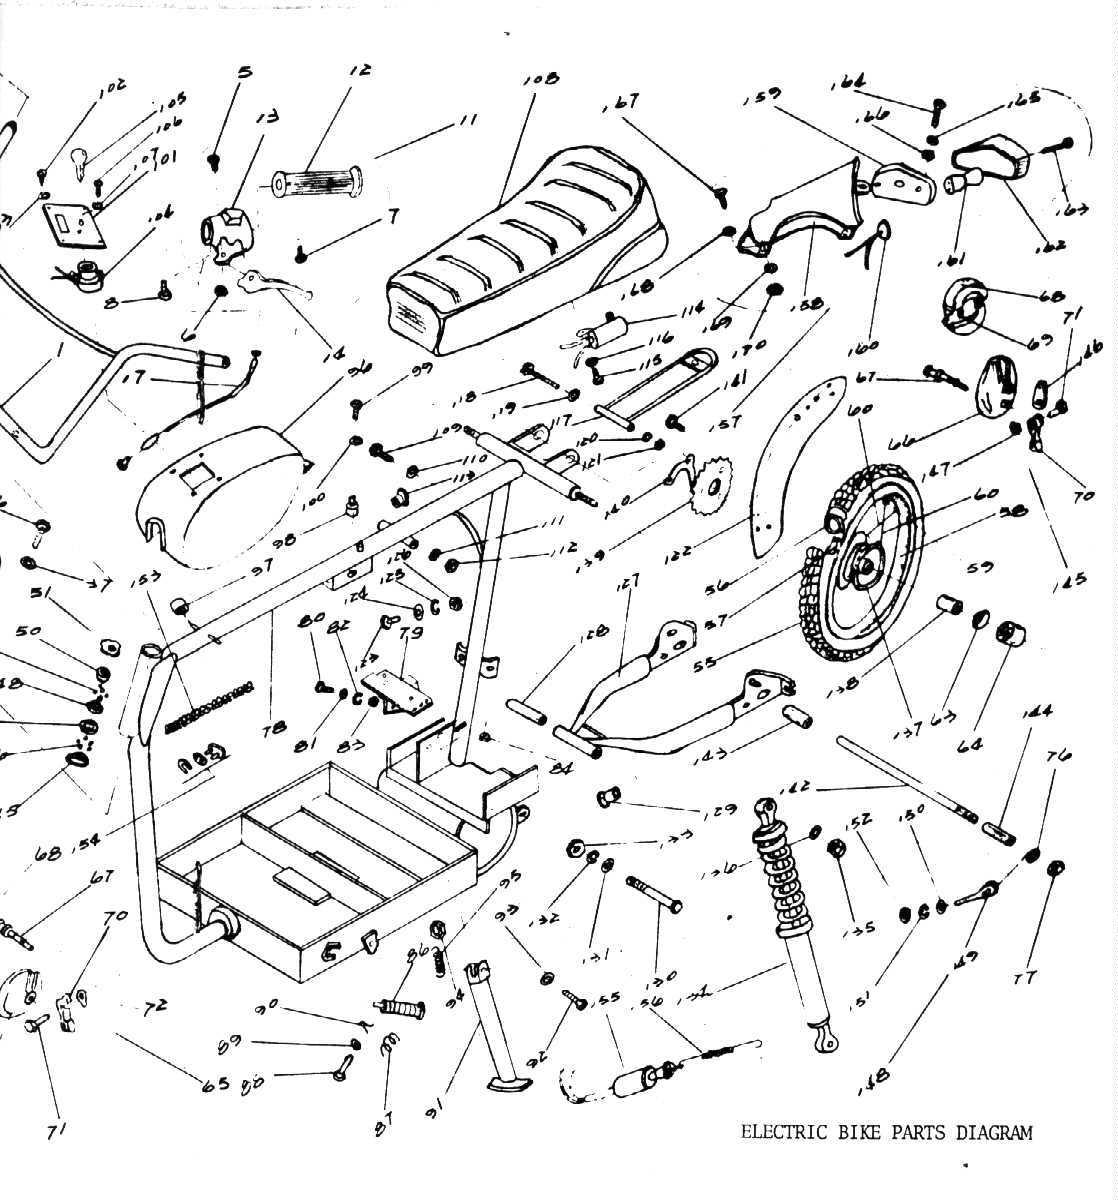 aurepg10 Harley Davidson Sportster Turn Signal Wiring Diagram on